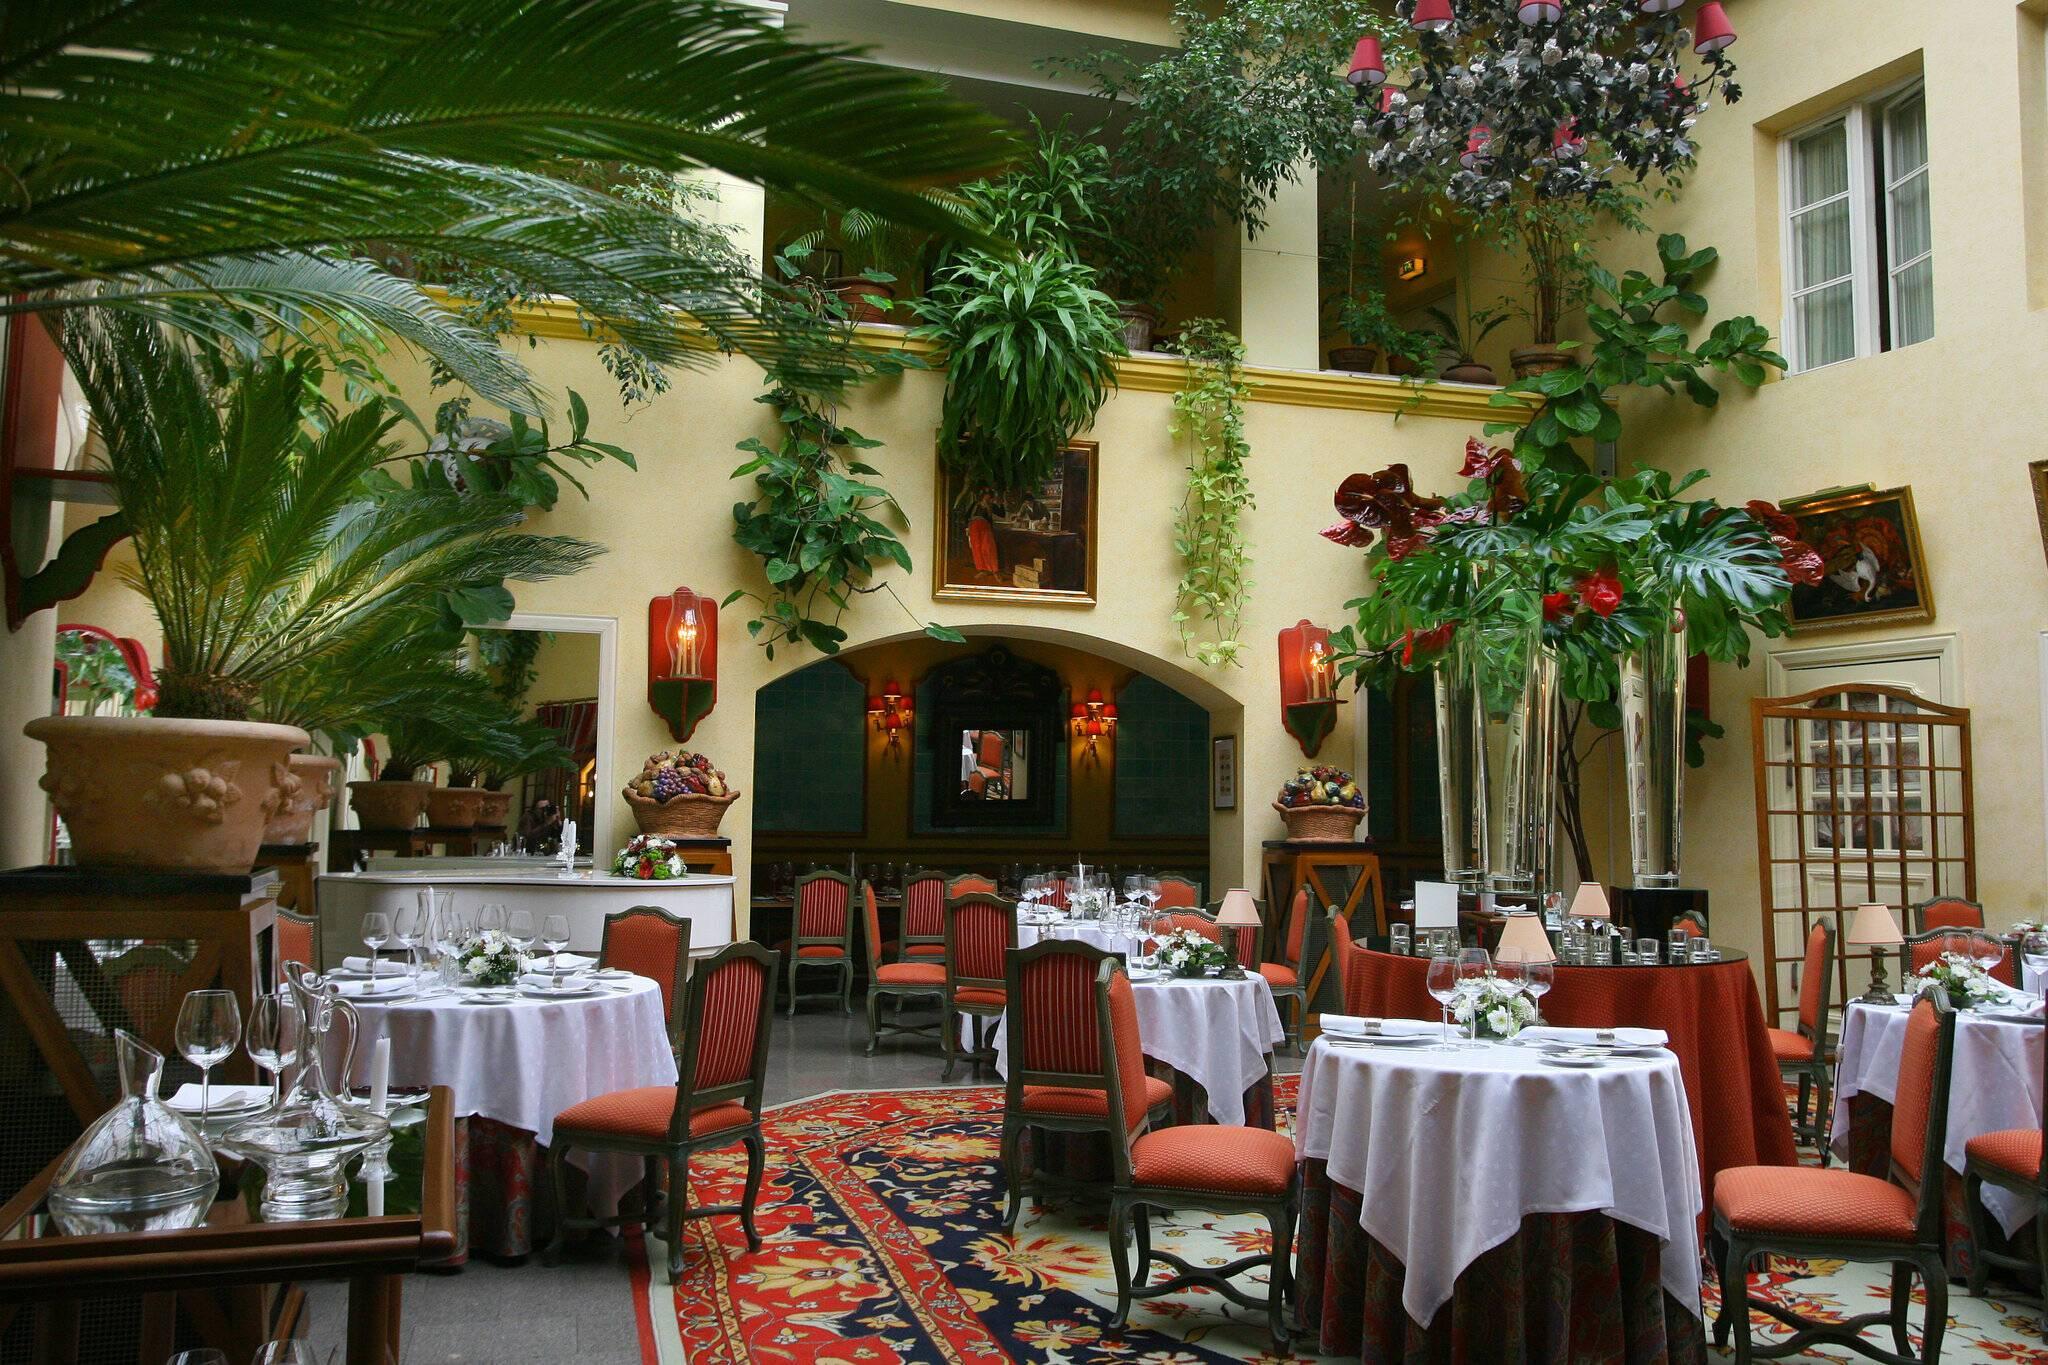 Vilnuis Stikliai Hotel Lituanie Pays Baltes